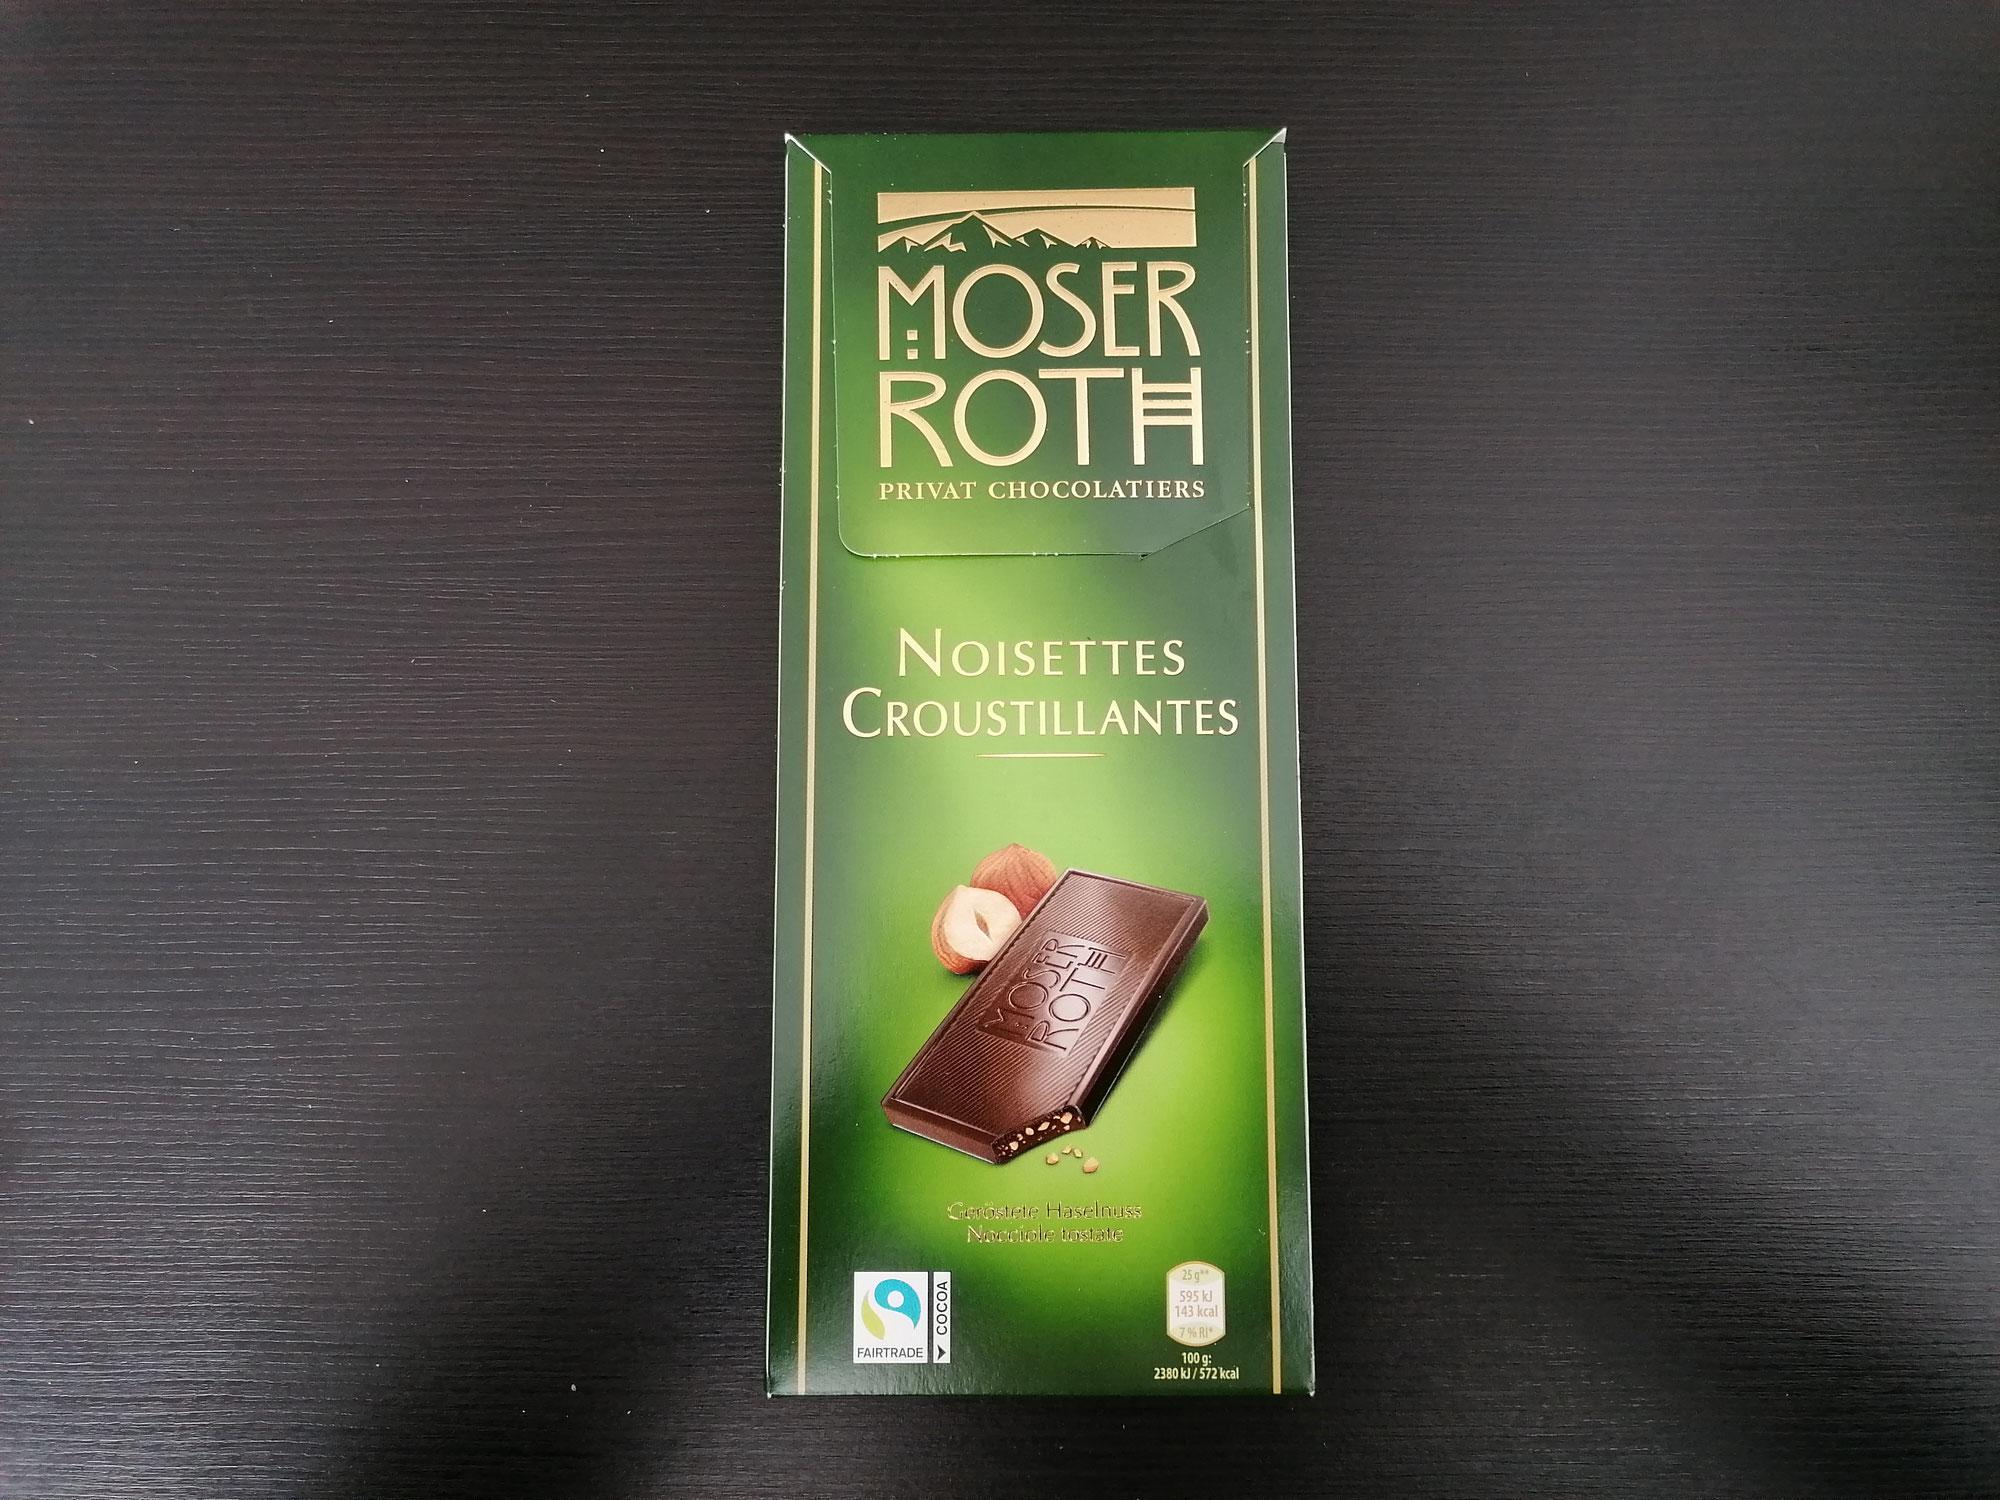 Moser Roth Noisettes Croustillantes